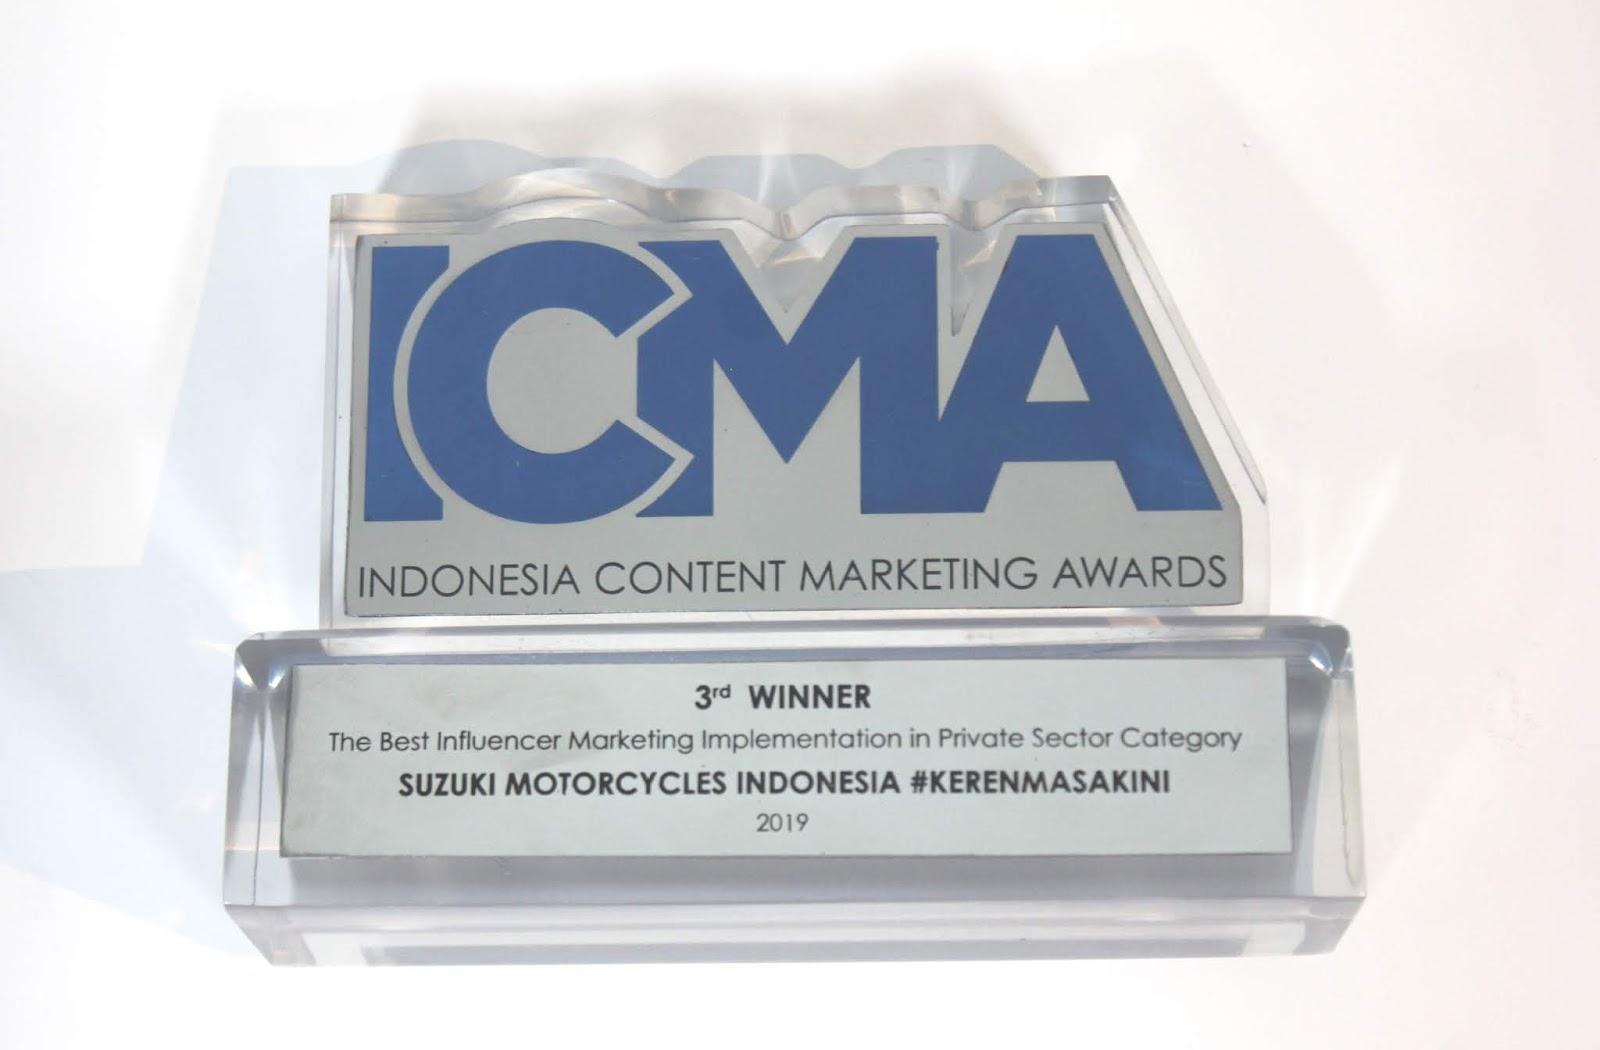 Suzuki Raih Penghargaan Indonesia Content Marketing Award 2019